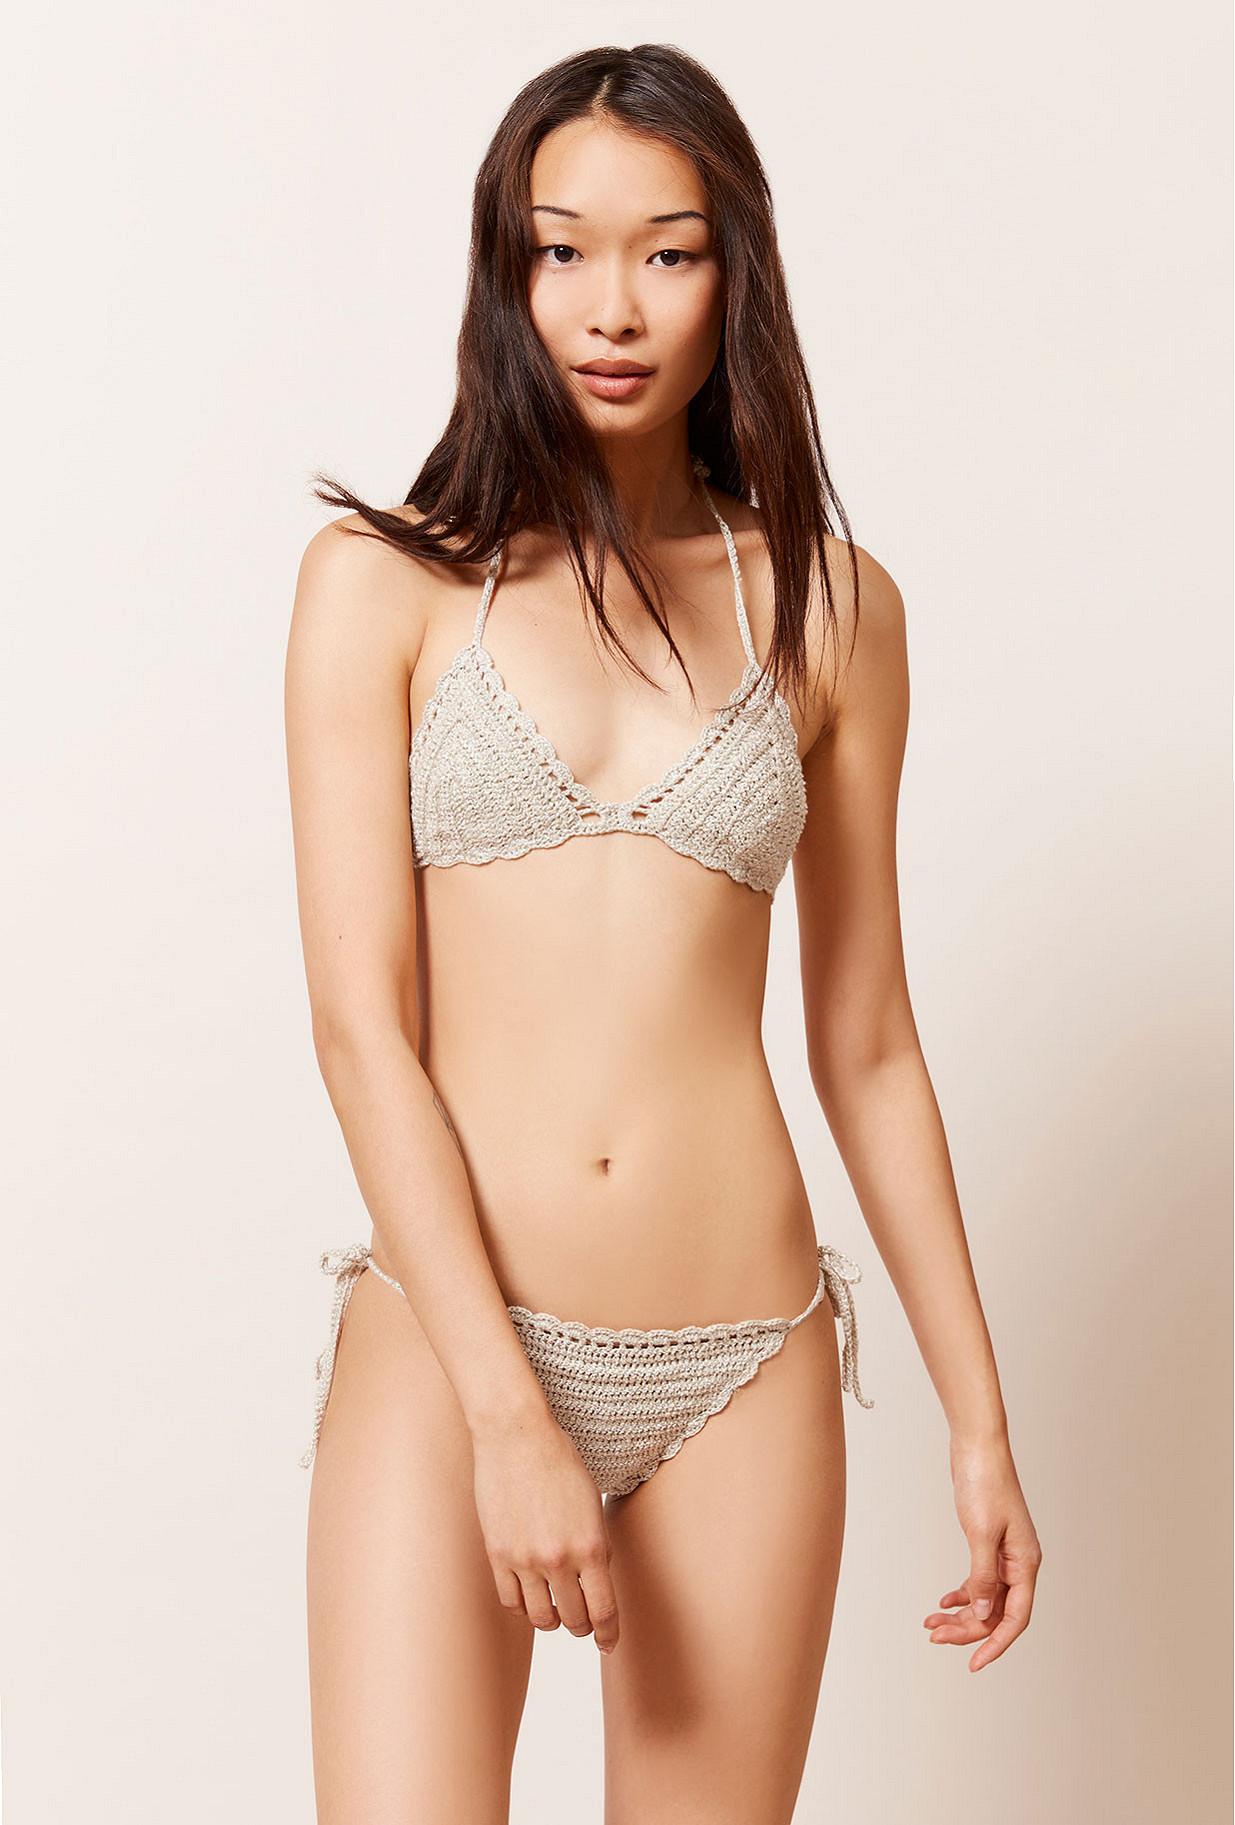 Silver Bikini Cricri Mes Demoiselles Paris